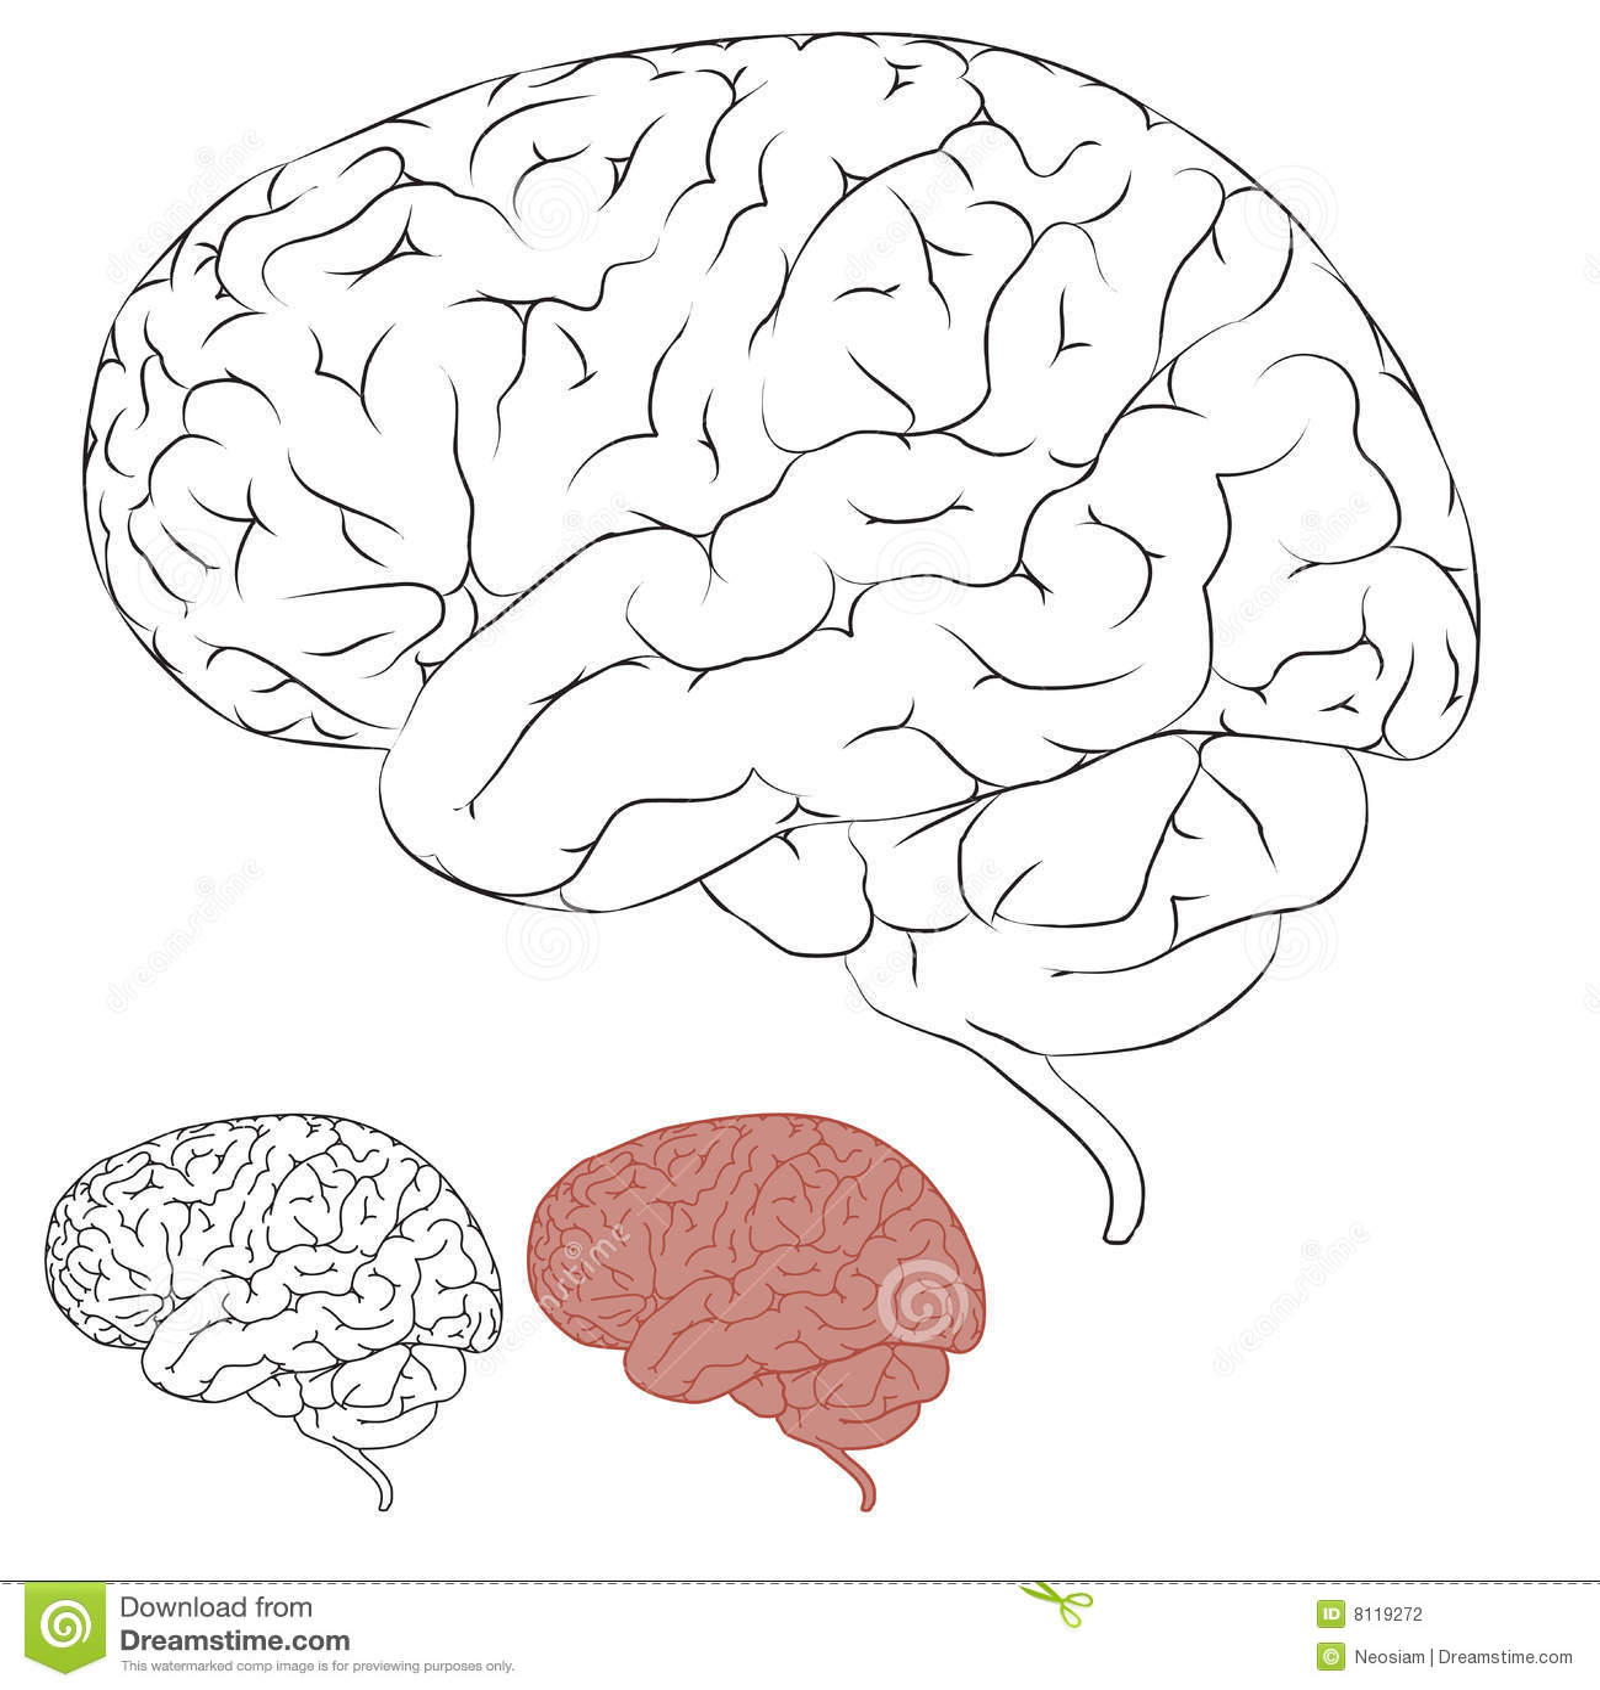 Drawing Human Brain Stock Vector Illustration Of Mental 8119272